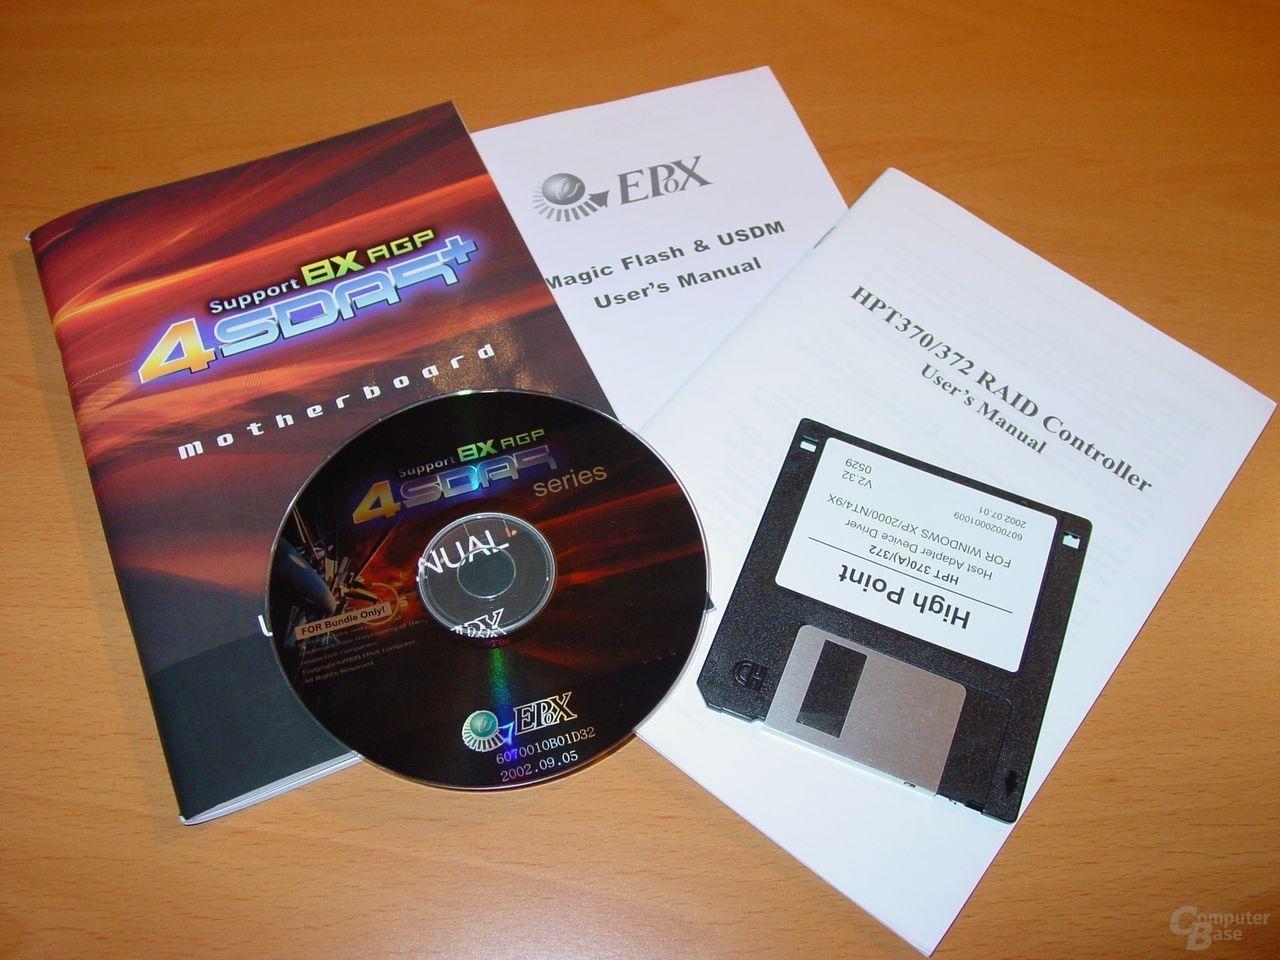 EPoX EP-4SDA5+ - Dokumentation